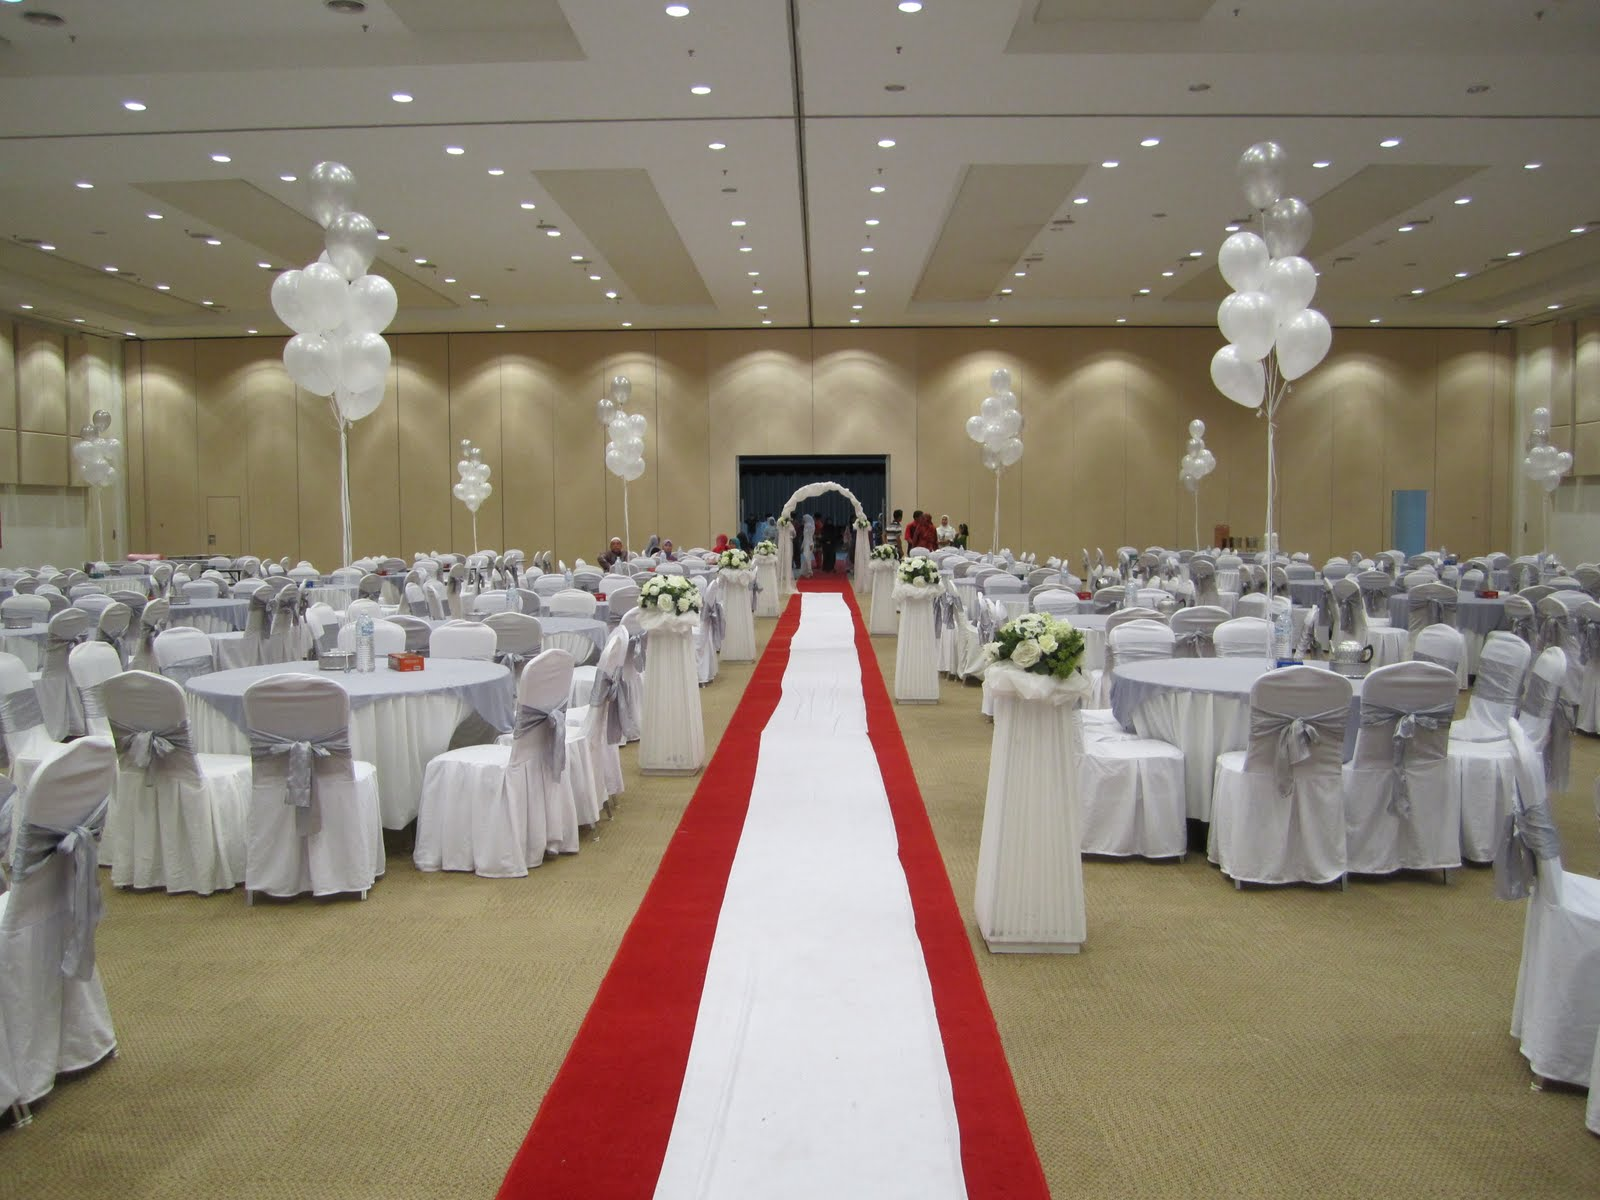 Maeps serdang wedding venues